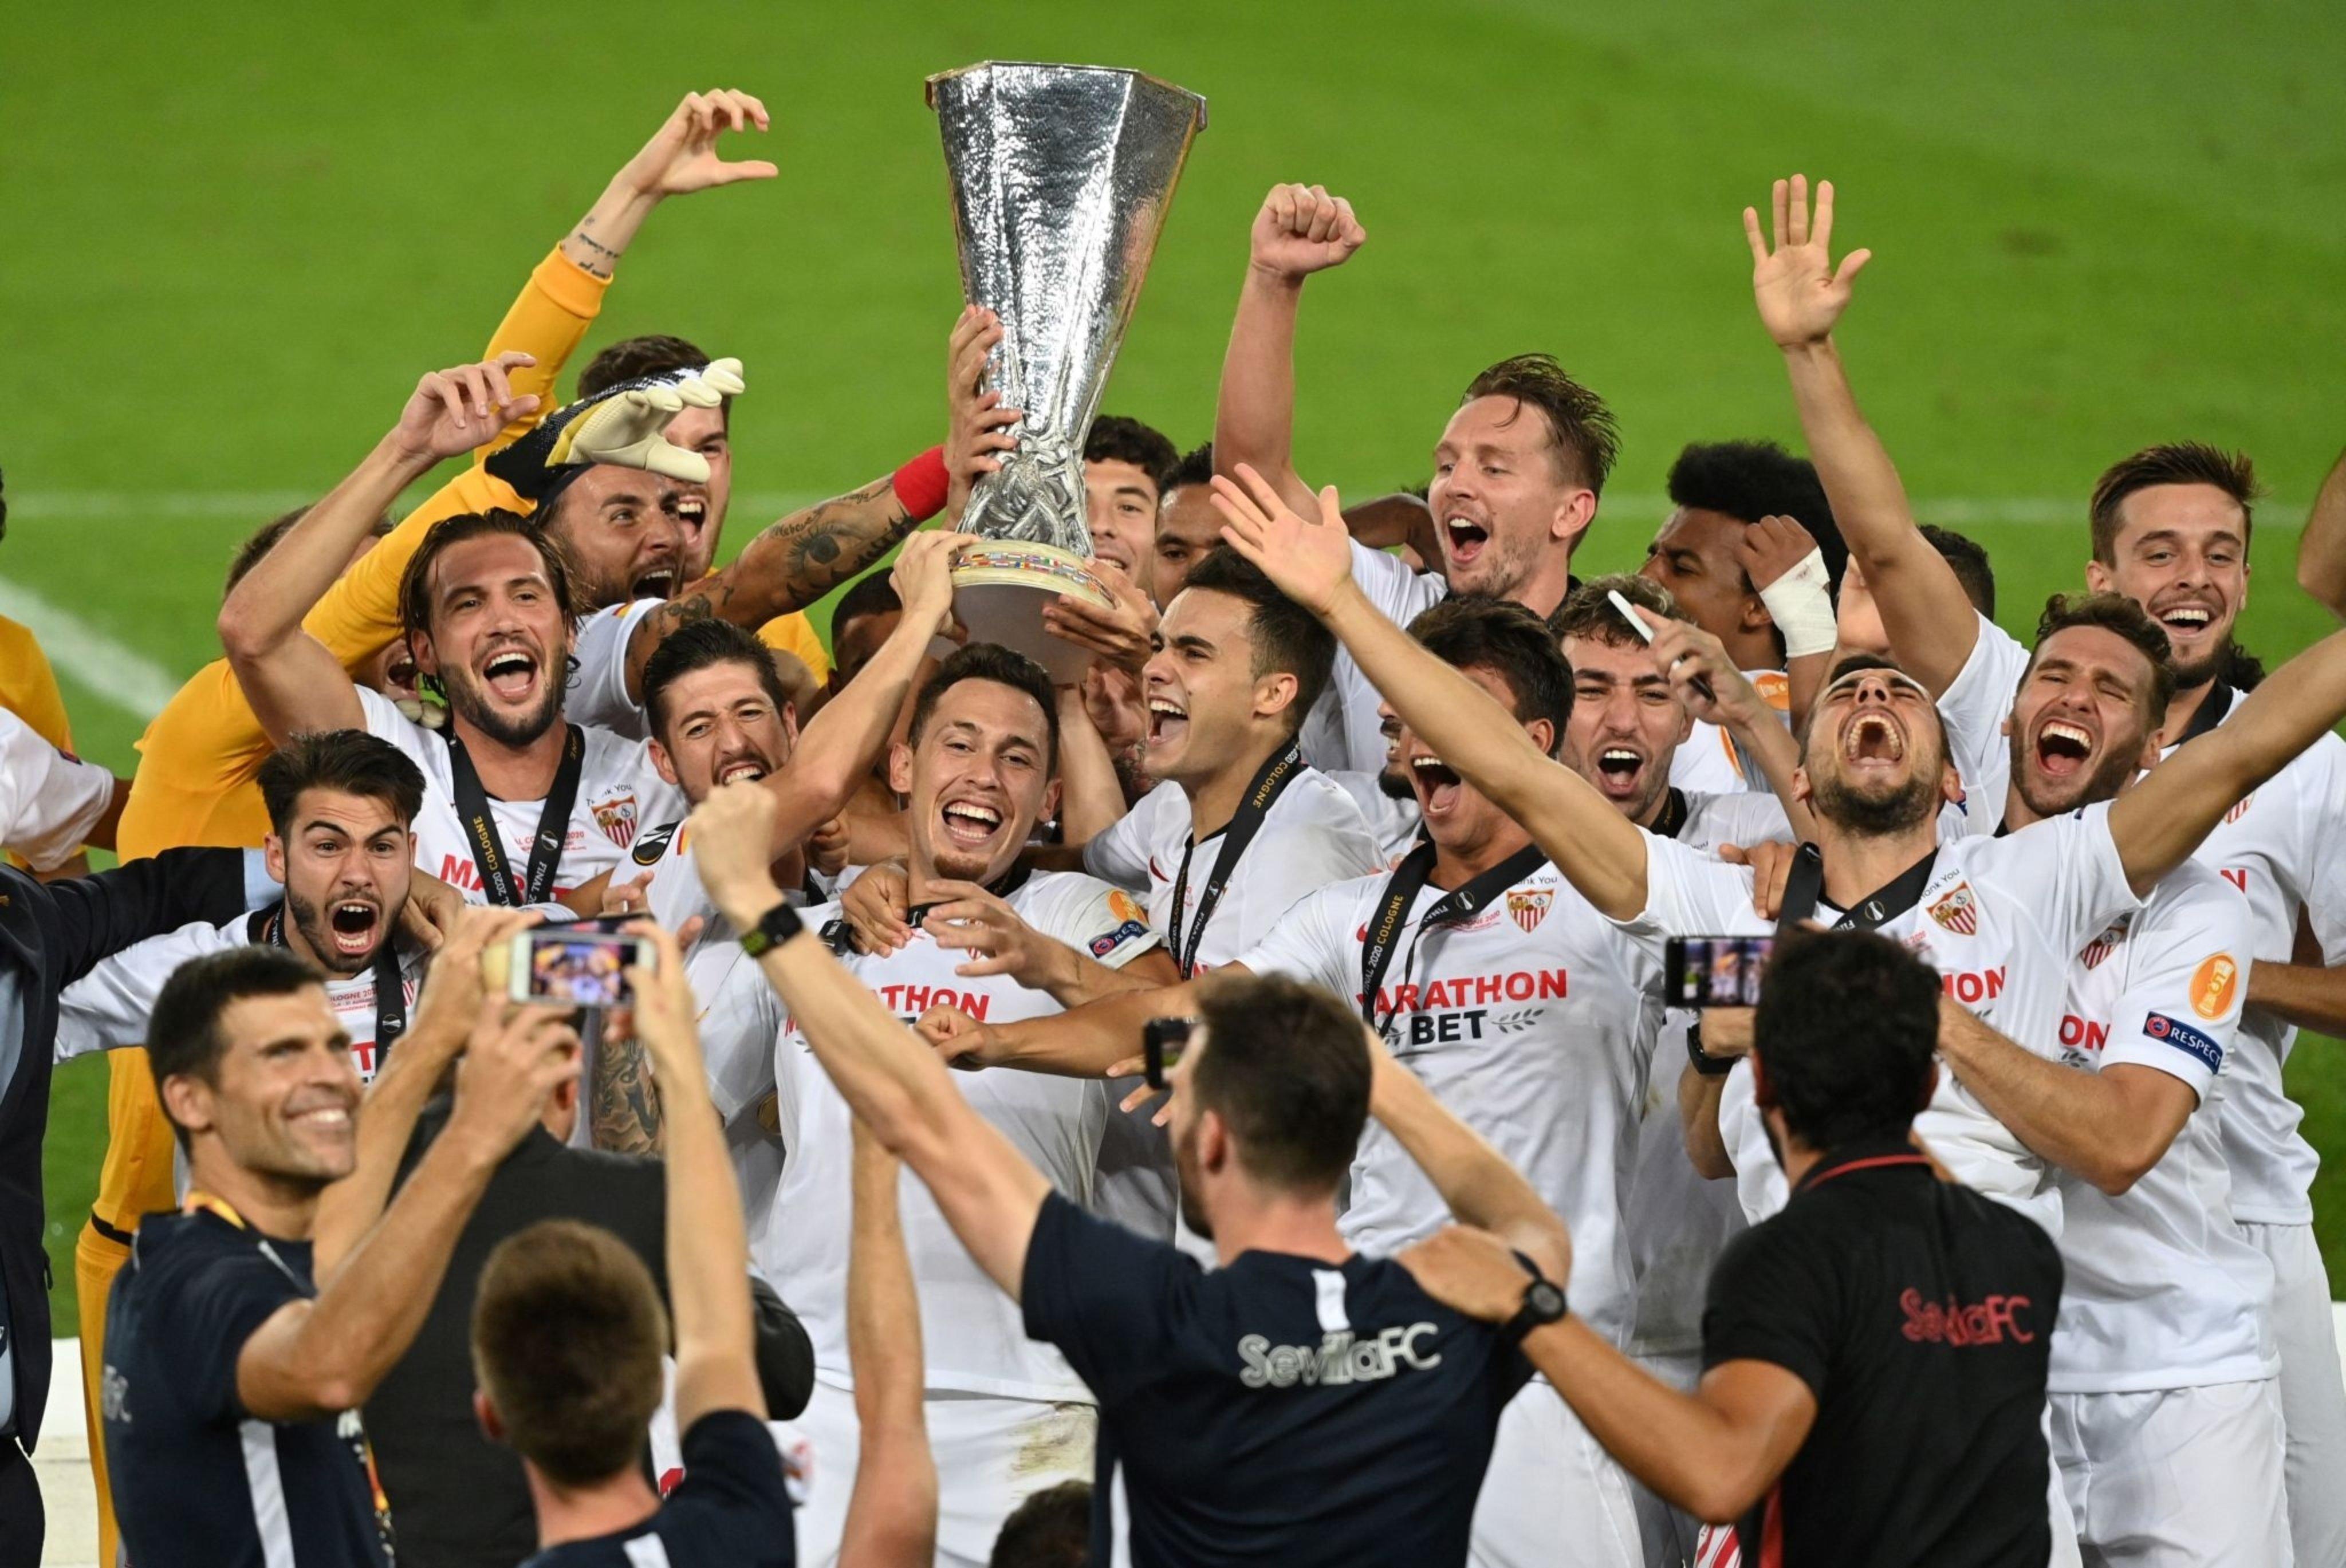 Piala Super Eropa 2020: Prediksi Line-up Bayern Munich vs ...